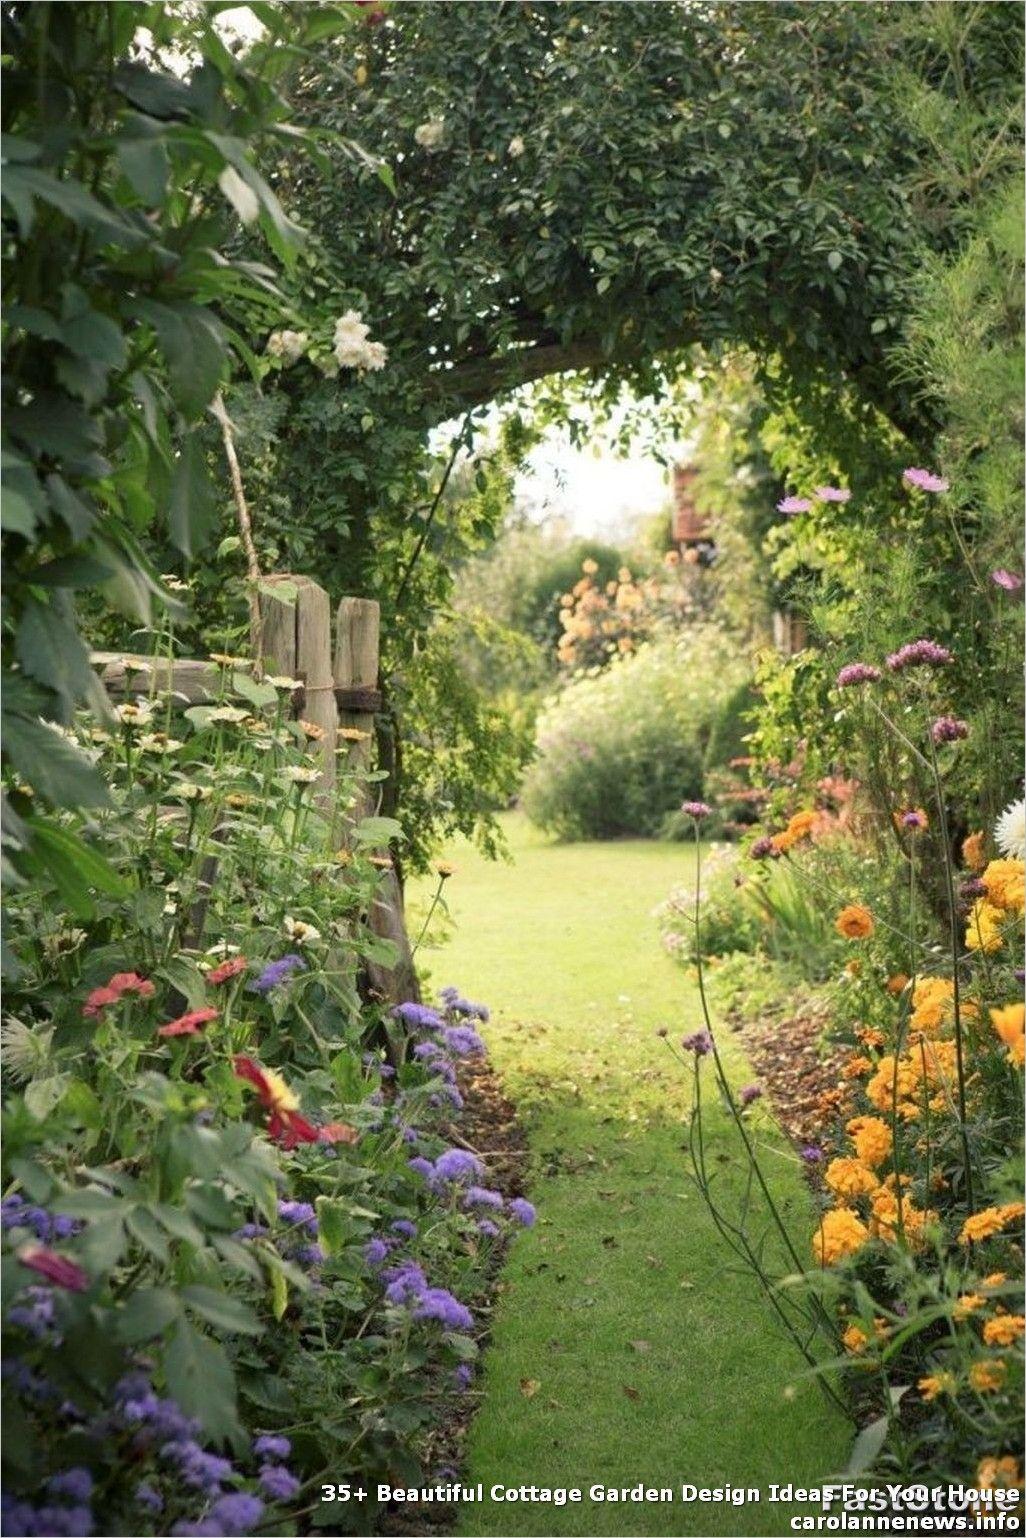 35 Beautiful Cottage Garden Design Ideas For Your House Page 20 Of 38 Carolanne Ne In 2020 Garden Landscape Design Beautiful Flowers Garden Perfect Garden